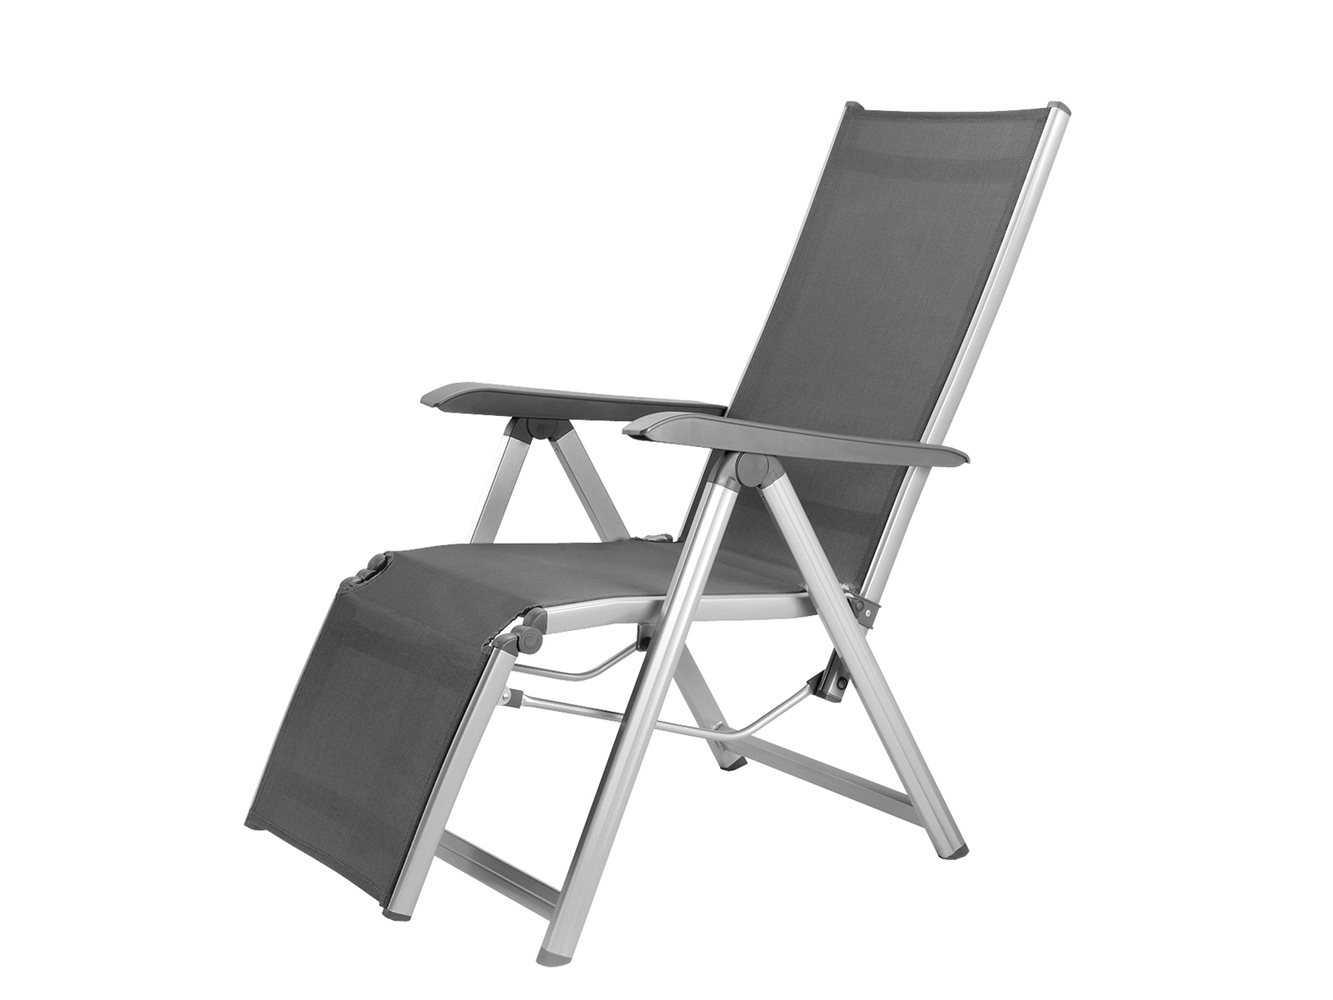 kettler basic plus relaxer silver gray 301216 0000. Black Bedroom Furniture Sets. Home Design Ideas